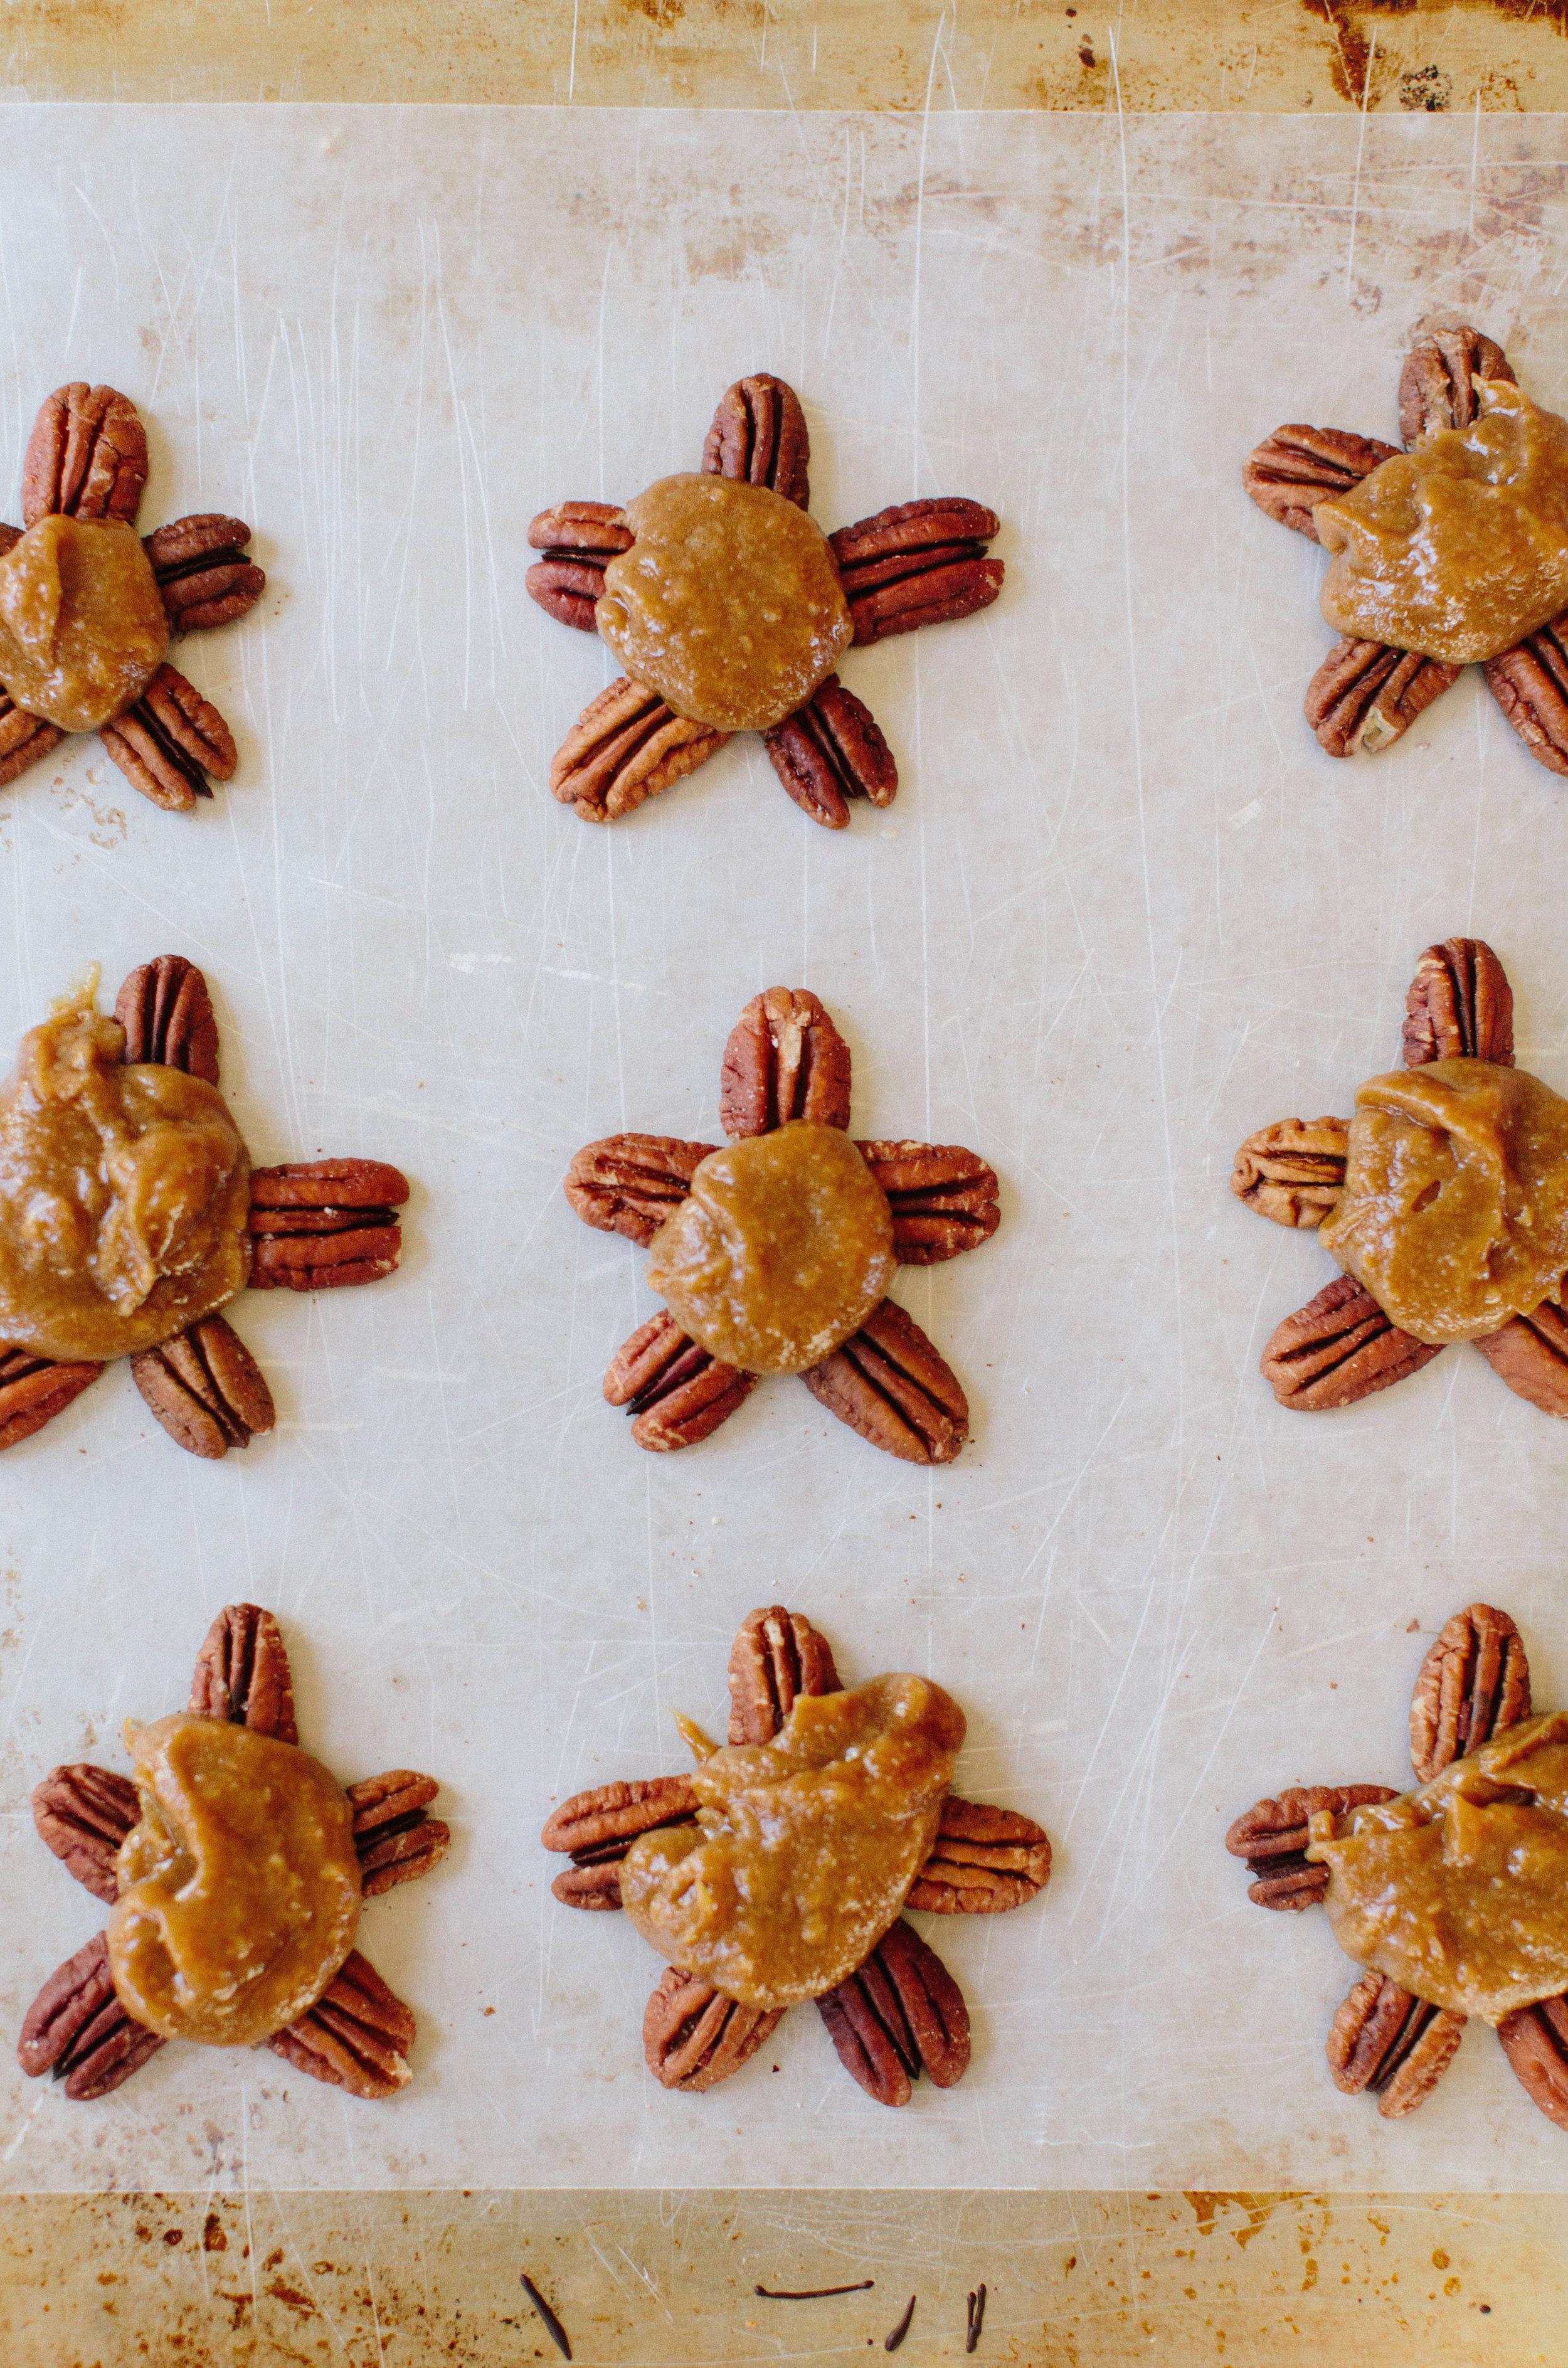 jennahazelphotography-vegan-turtles-6659.jpg